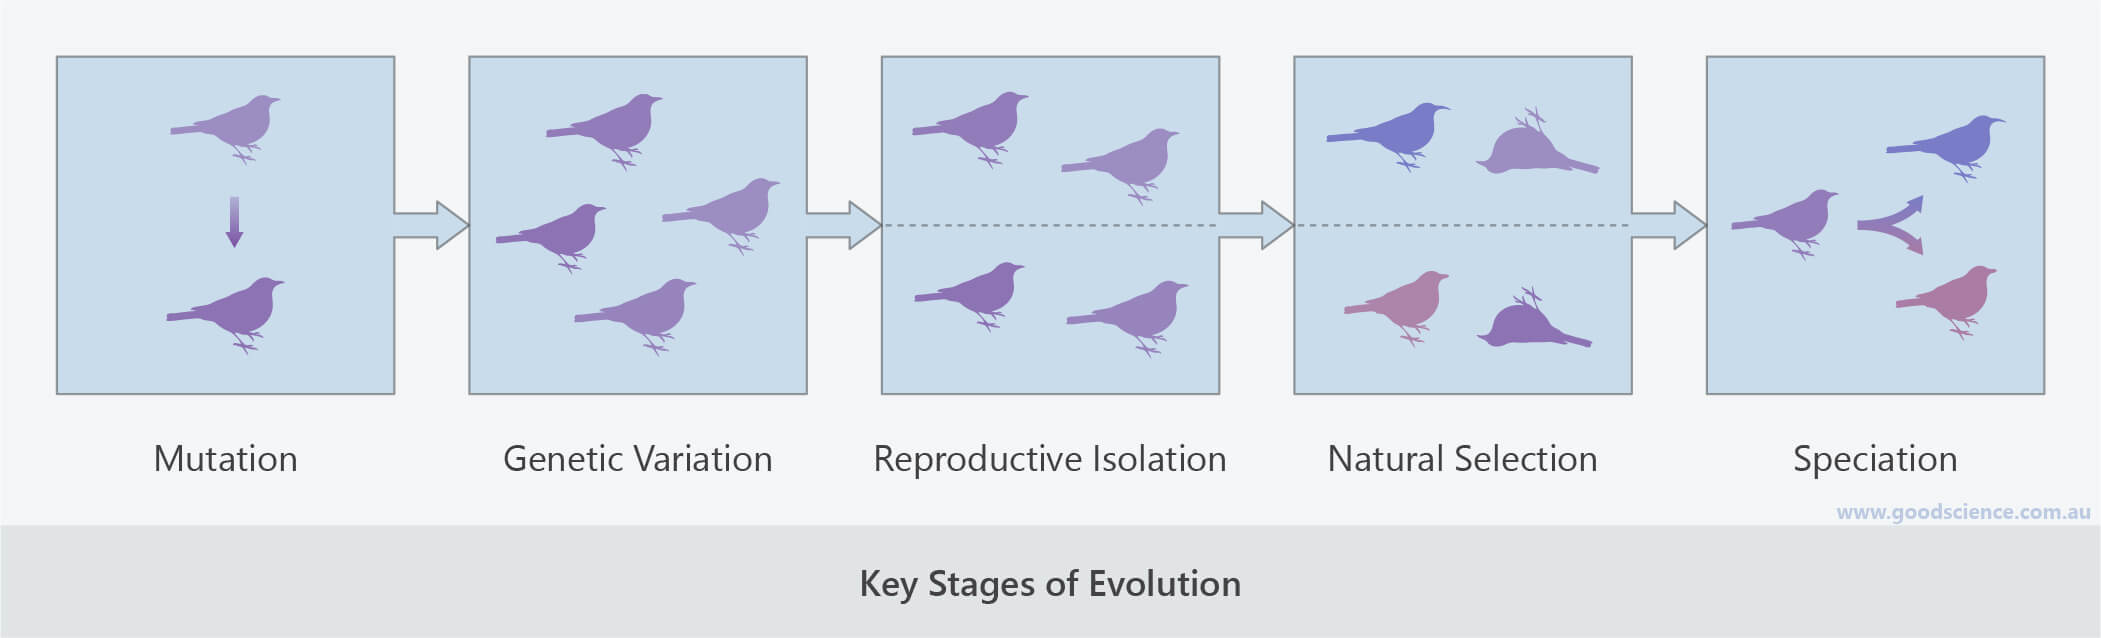 key stages of evolution